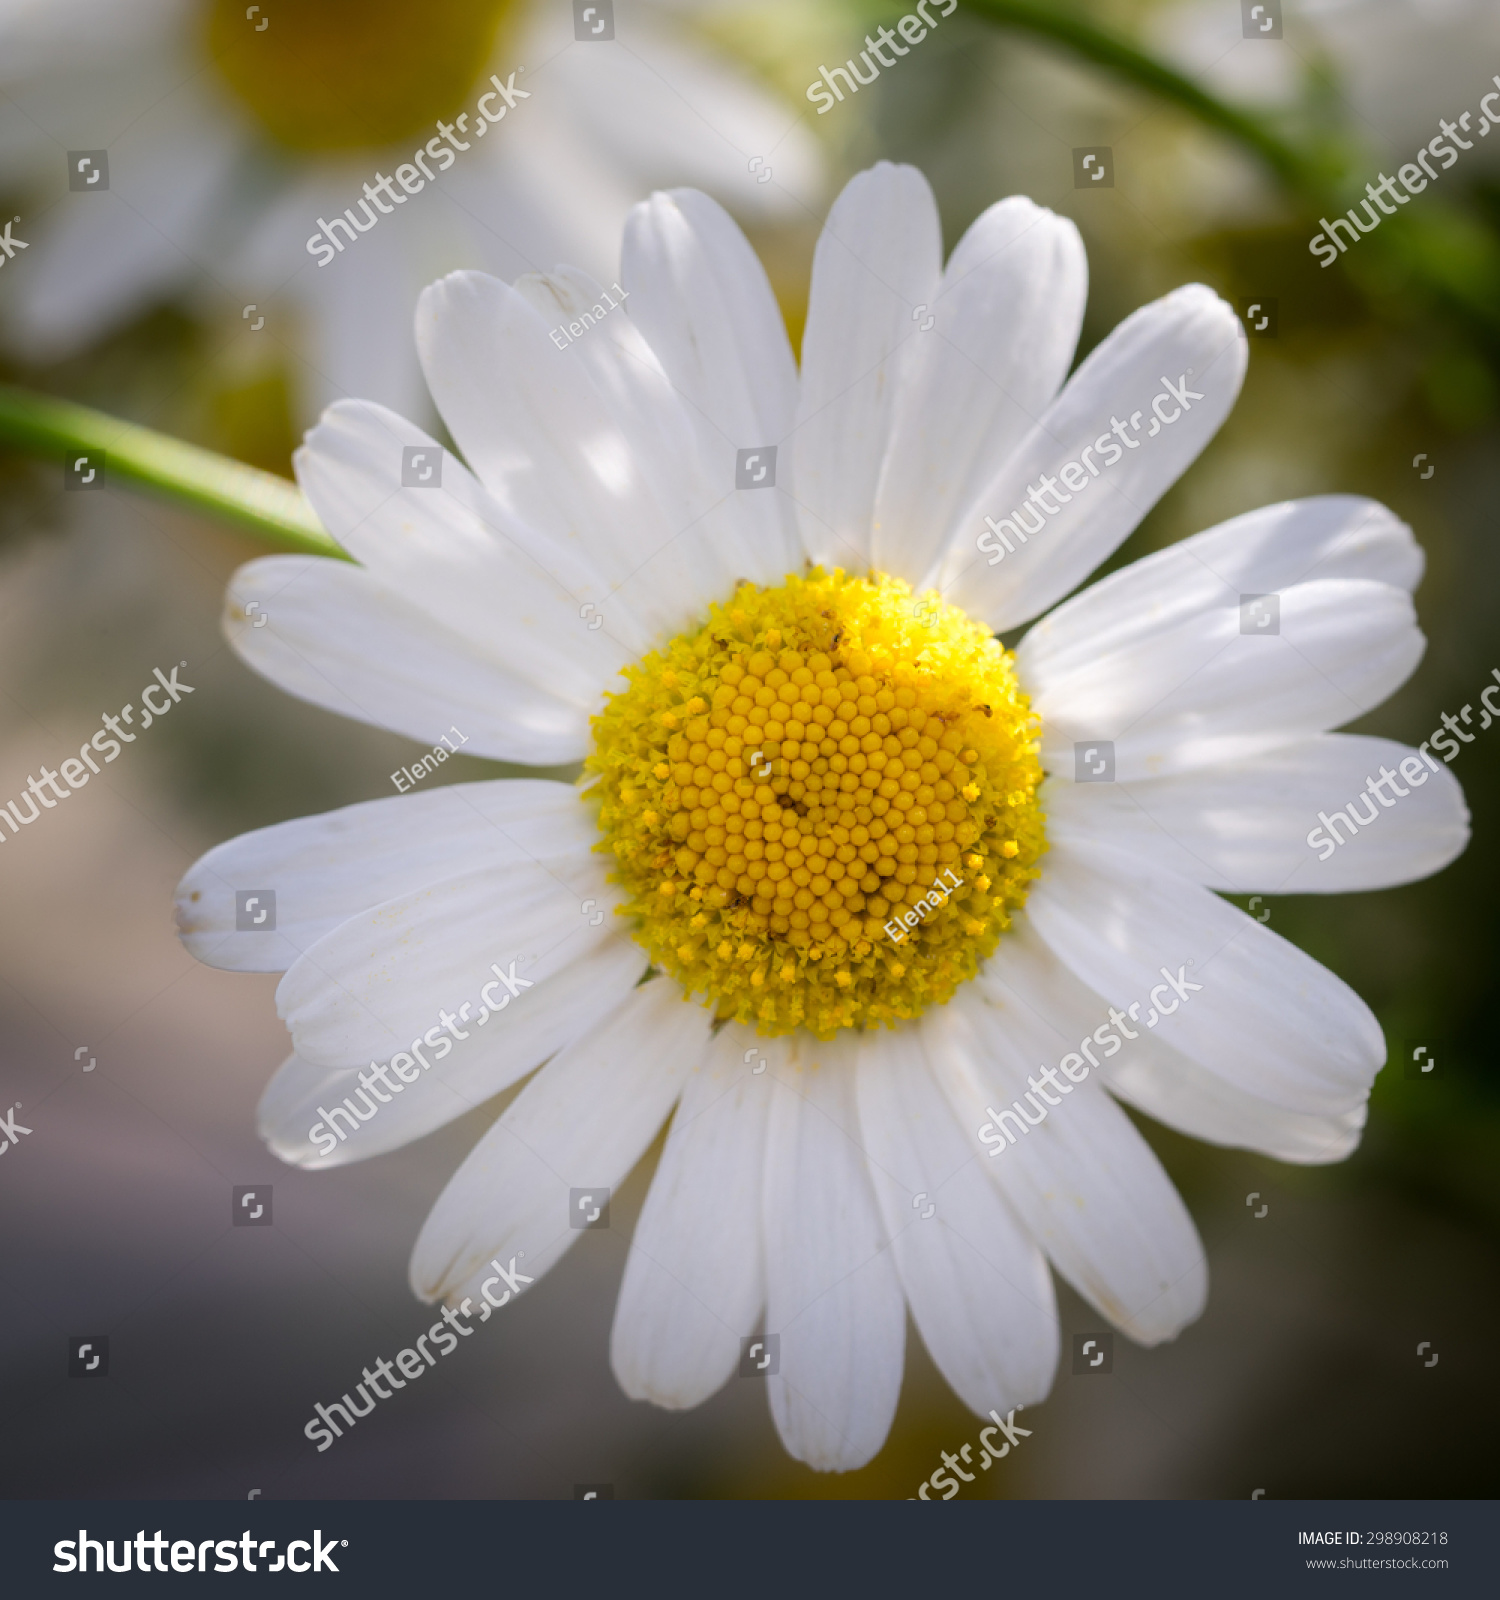 Beautiful daisy flower stock photo 298908218 shutterstock beautiful daisy flower izmirmasajfo Choice Image